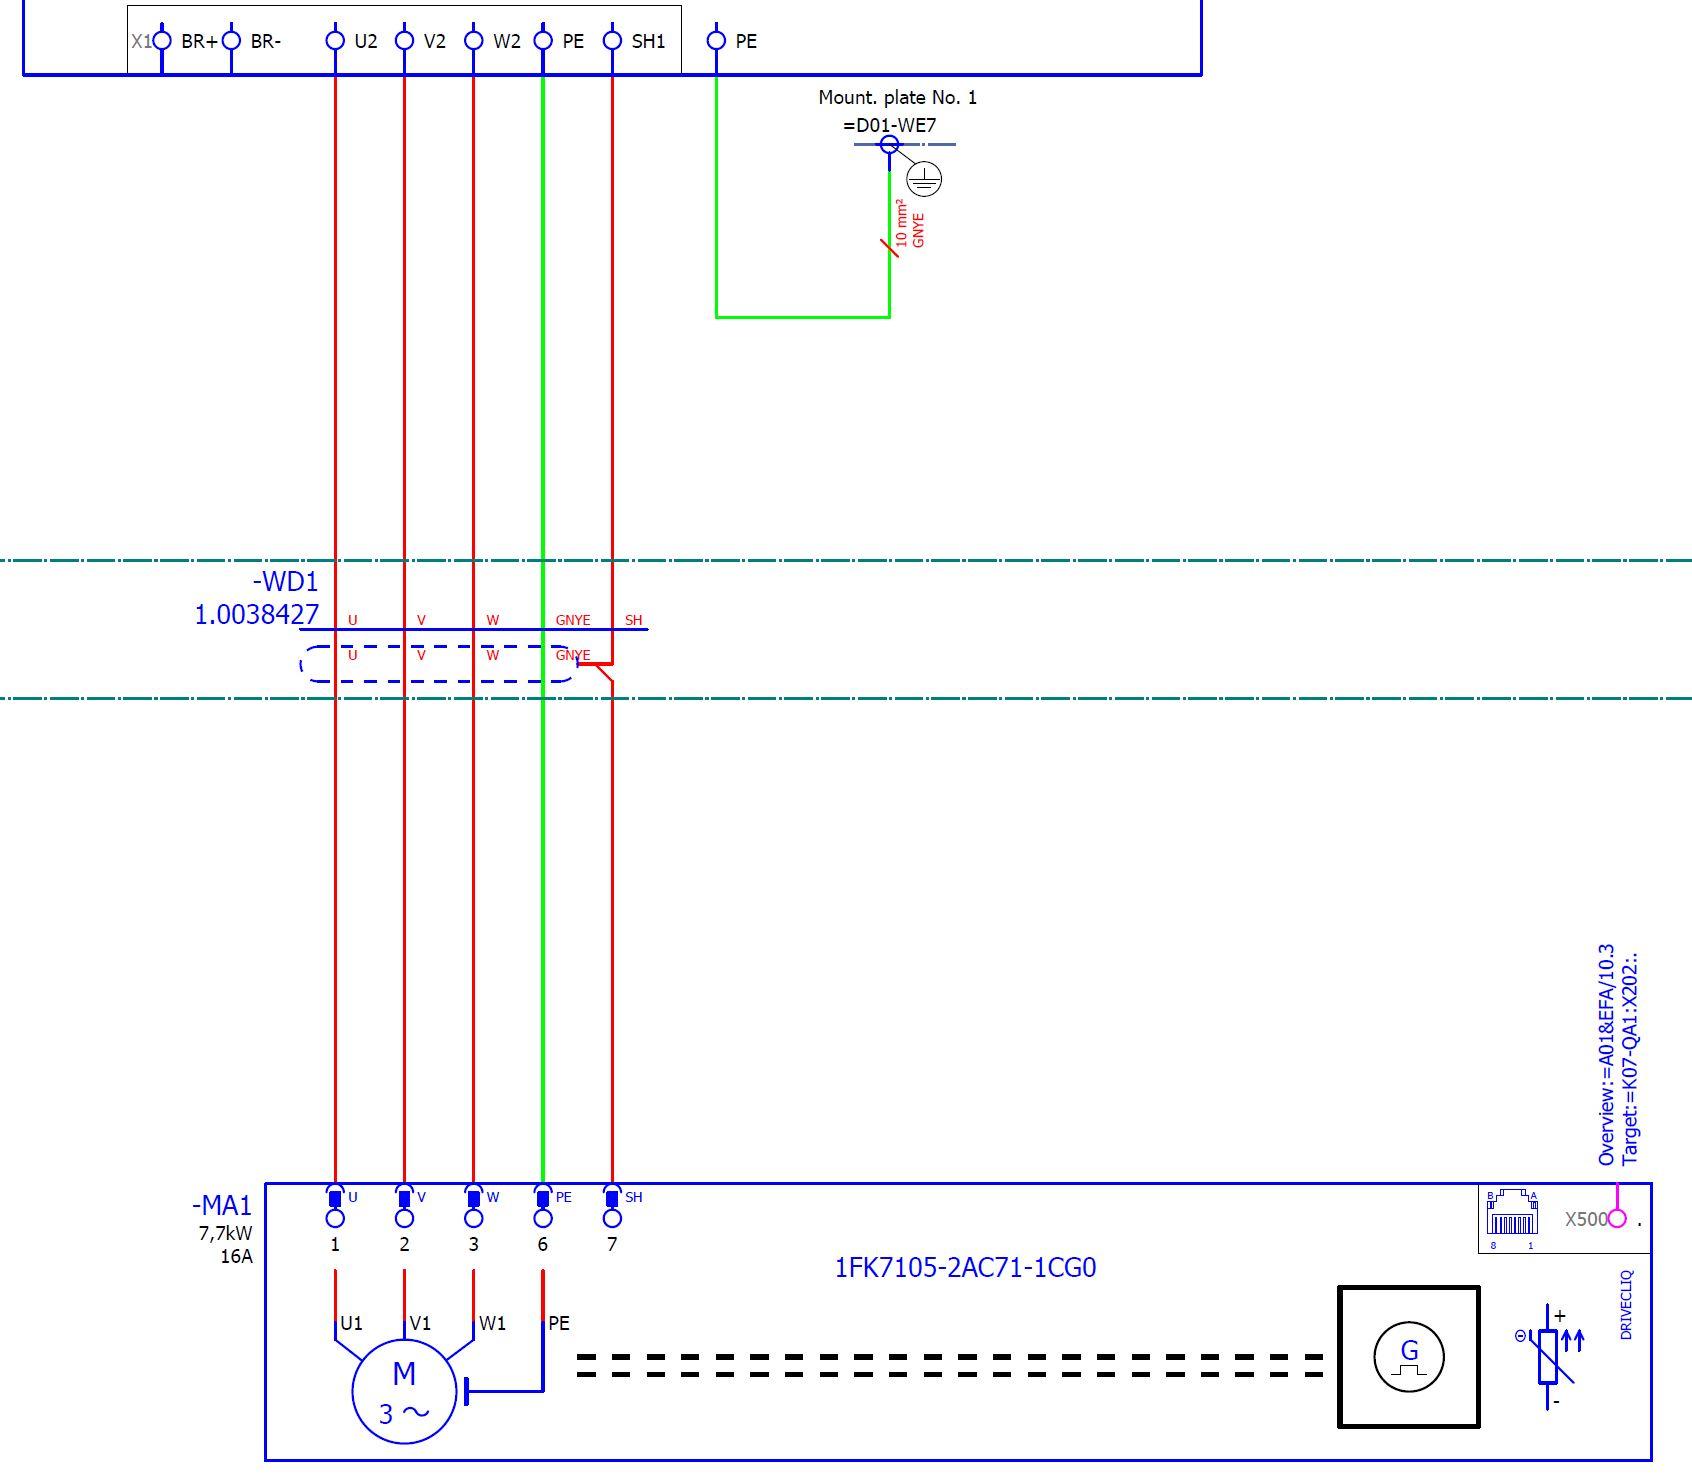 Verbindung Kabelschirm mit Schirmanschluss Elektrotechnik/EPLAN ...